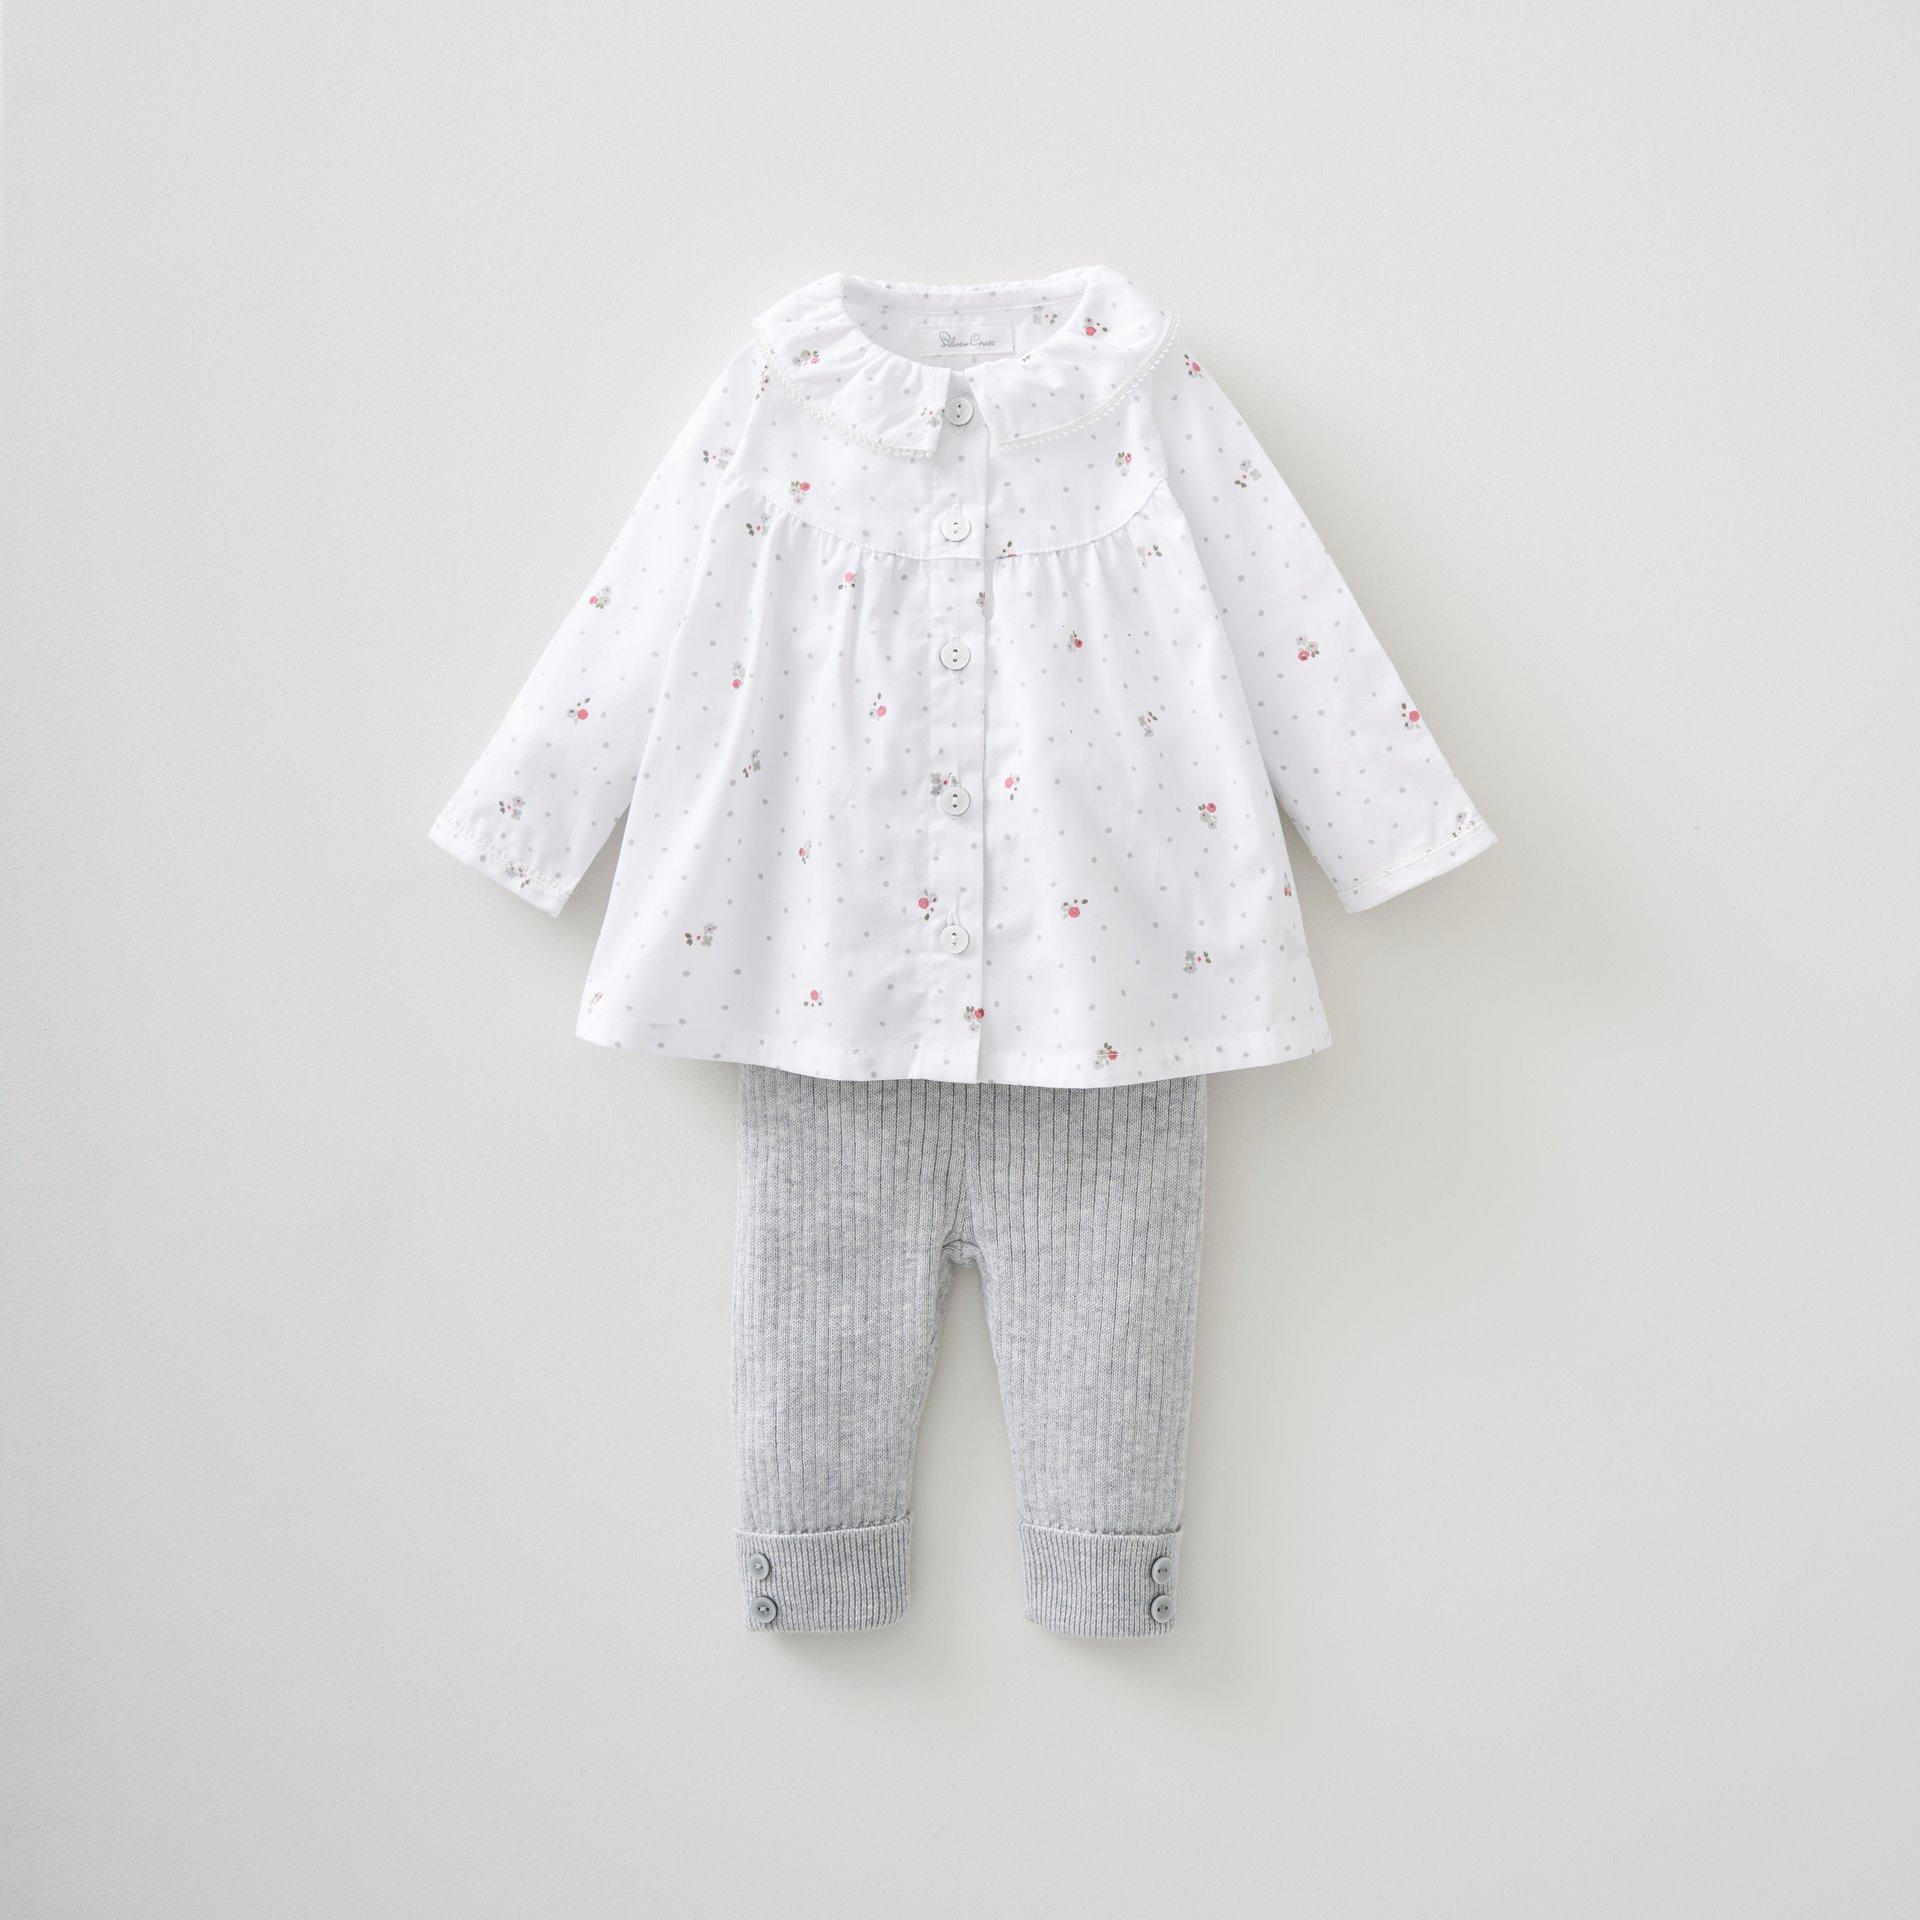 Blouse & Knitted Legging Set 6-9 Months